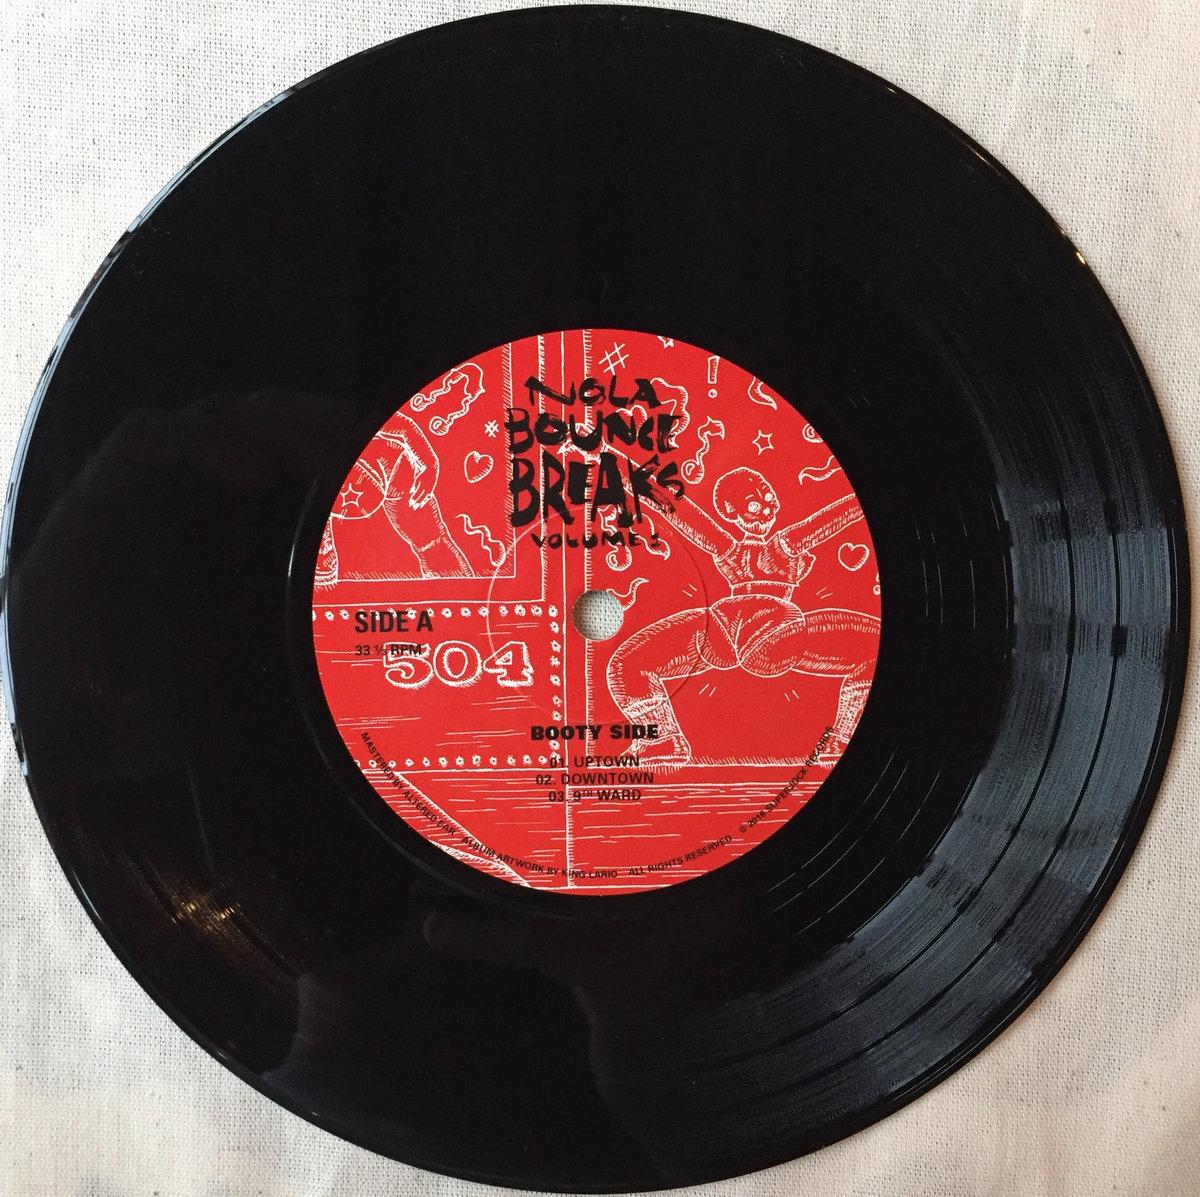 NOLA Bounce Breaks V1 | Superjock Records